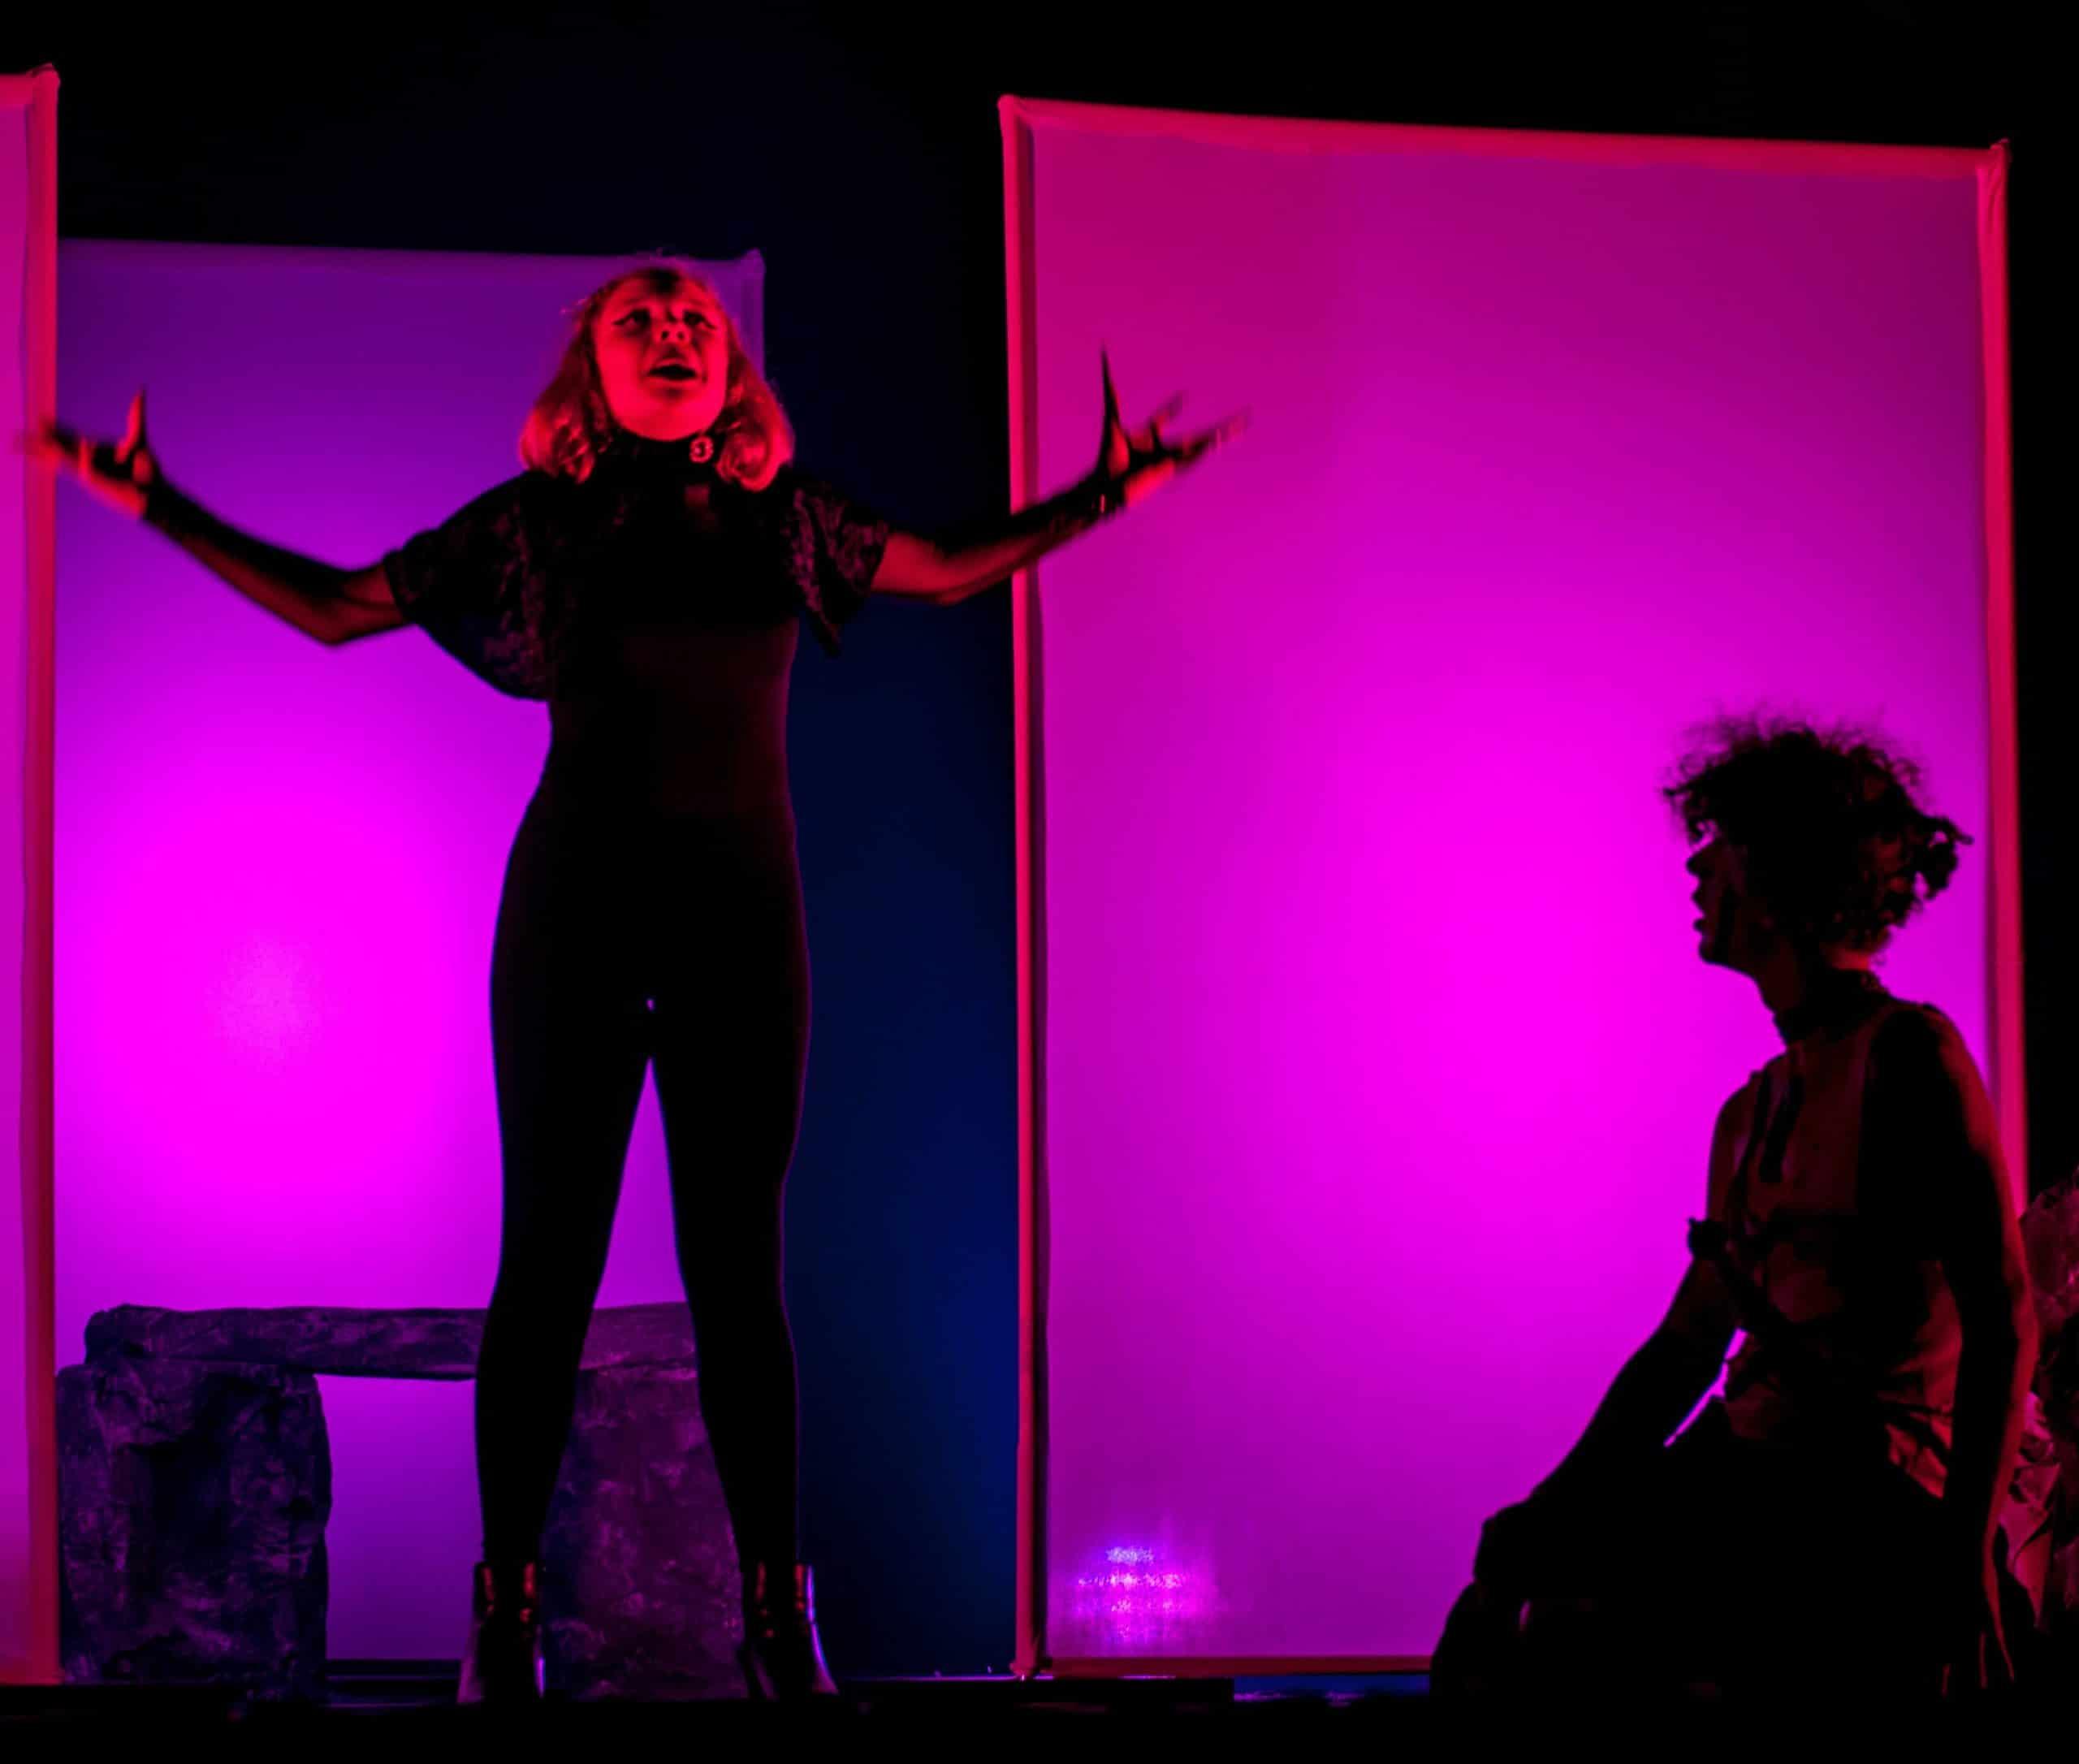 Macbeth Re-Arisen Jenna